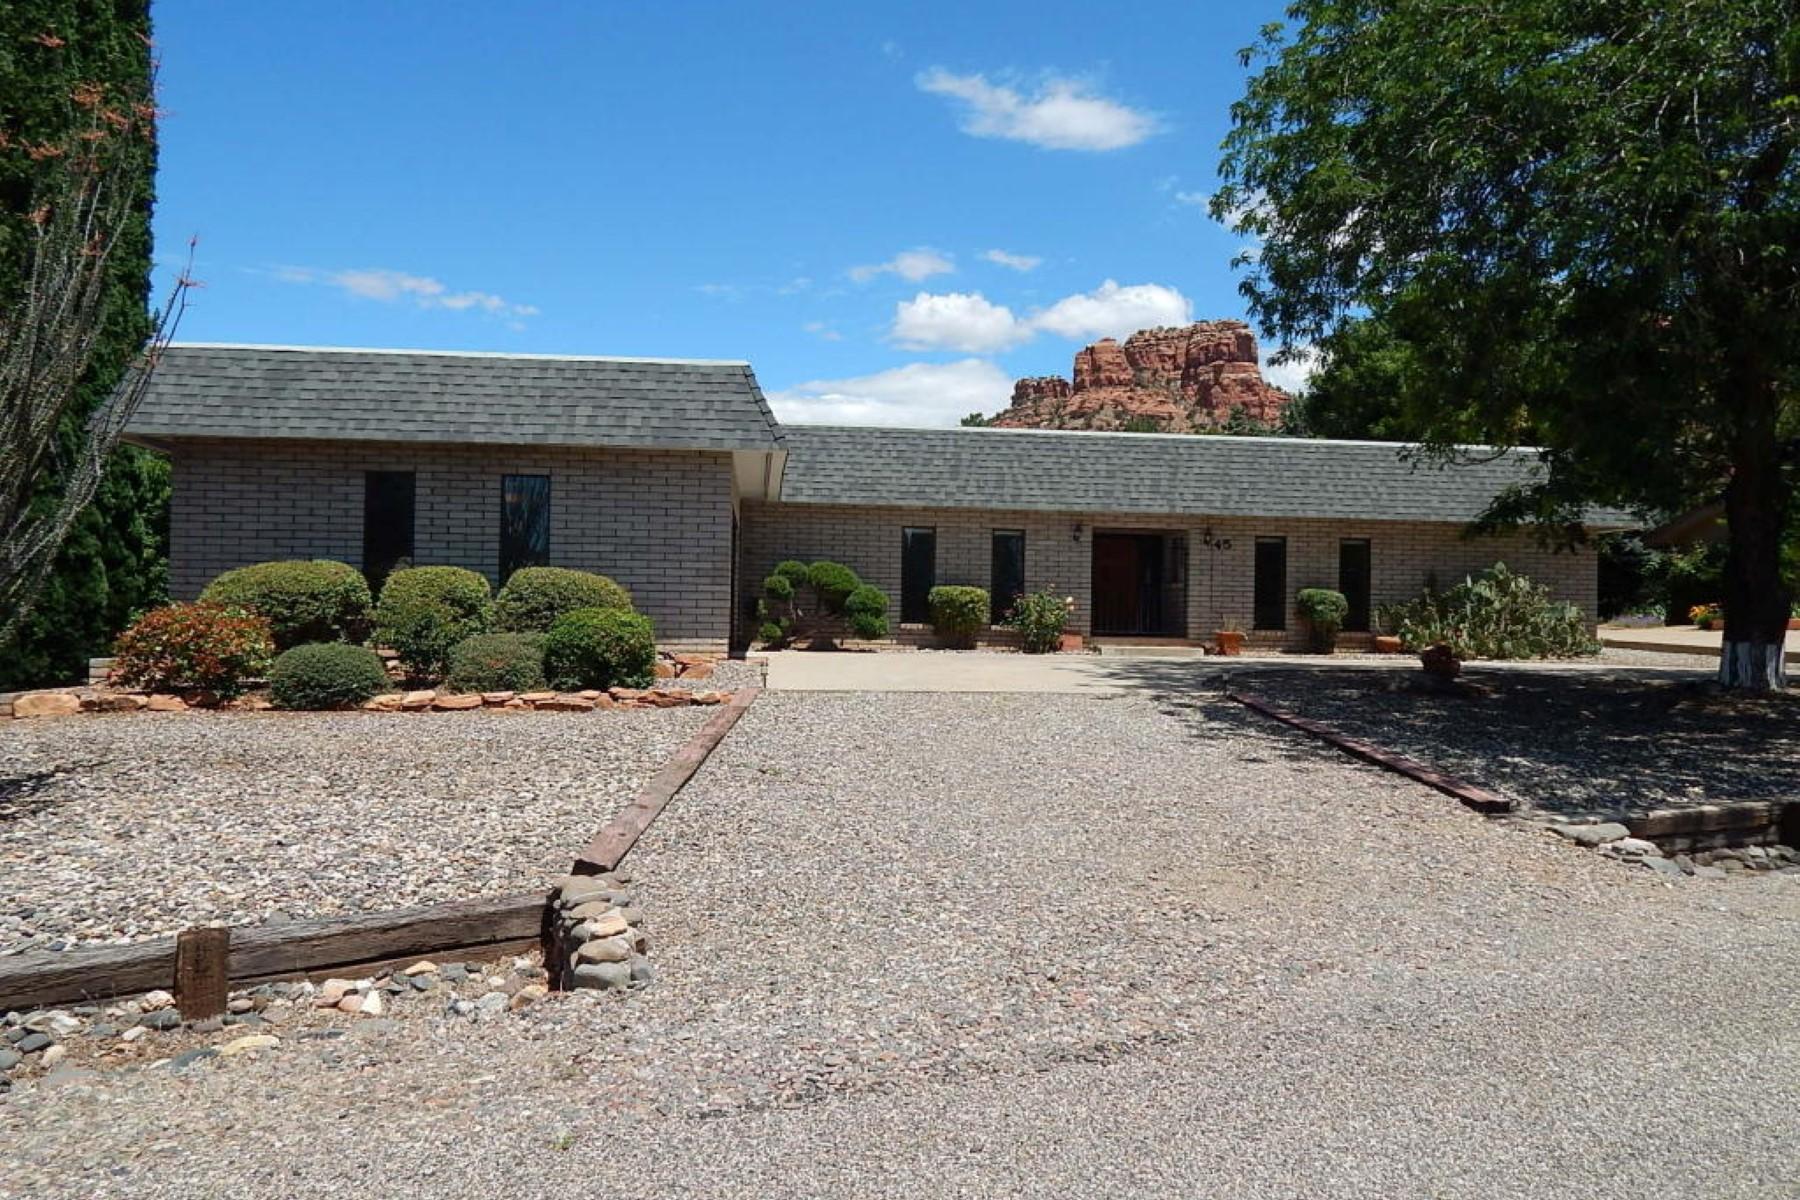 Частный односемейный дом для того Продажа на This home is incredibly maintained and shows pride of ownership. 45 Sandrock Rd Sedona, Аризона 86351 Соединенные Штаты